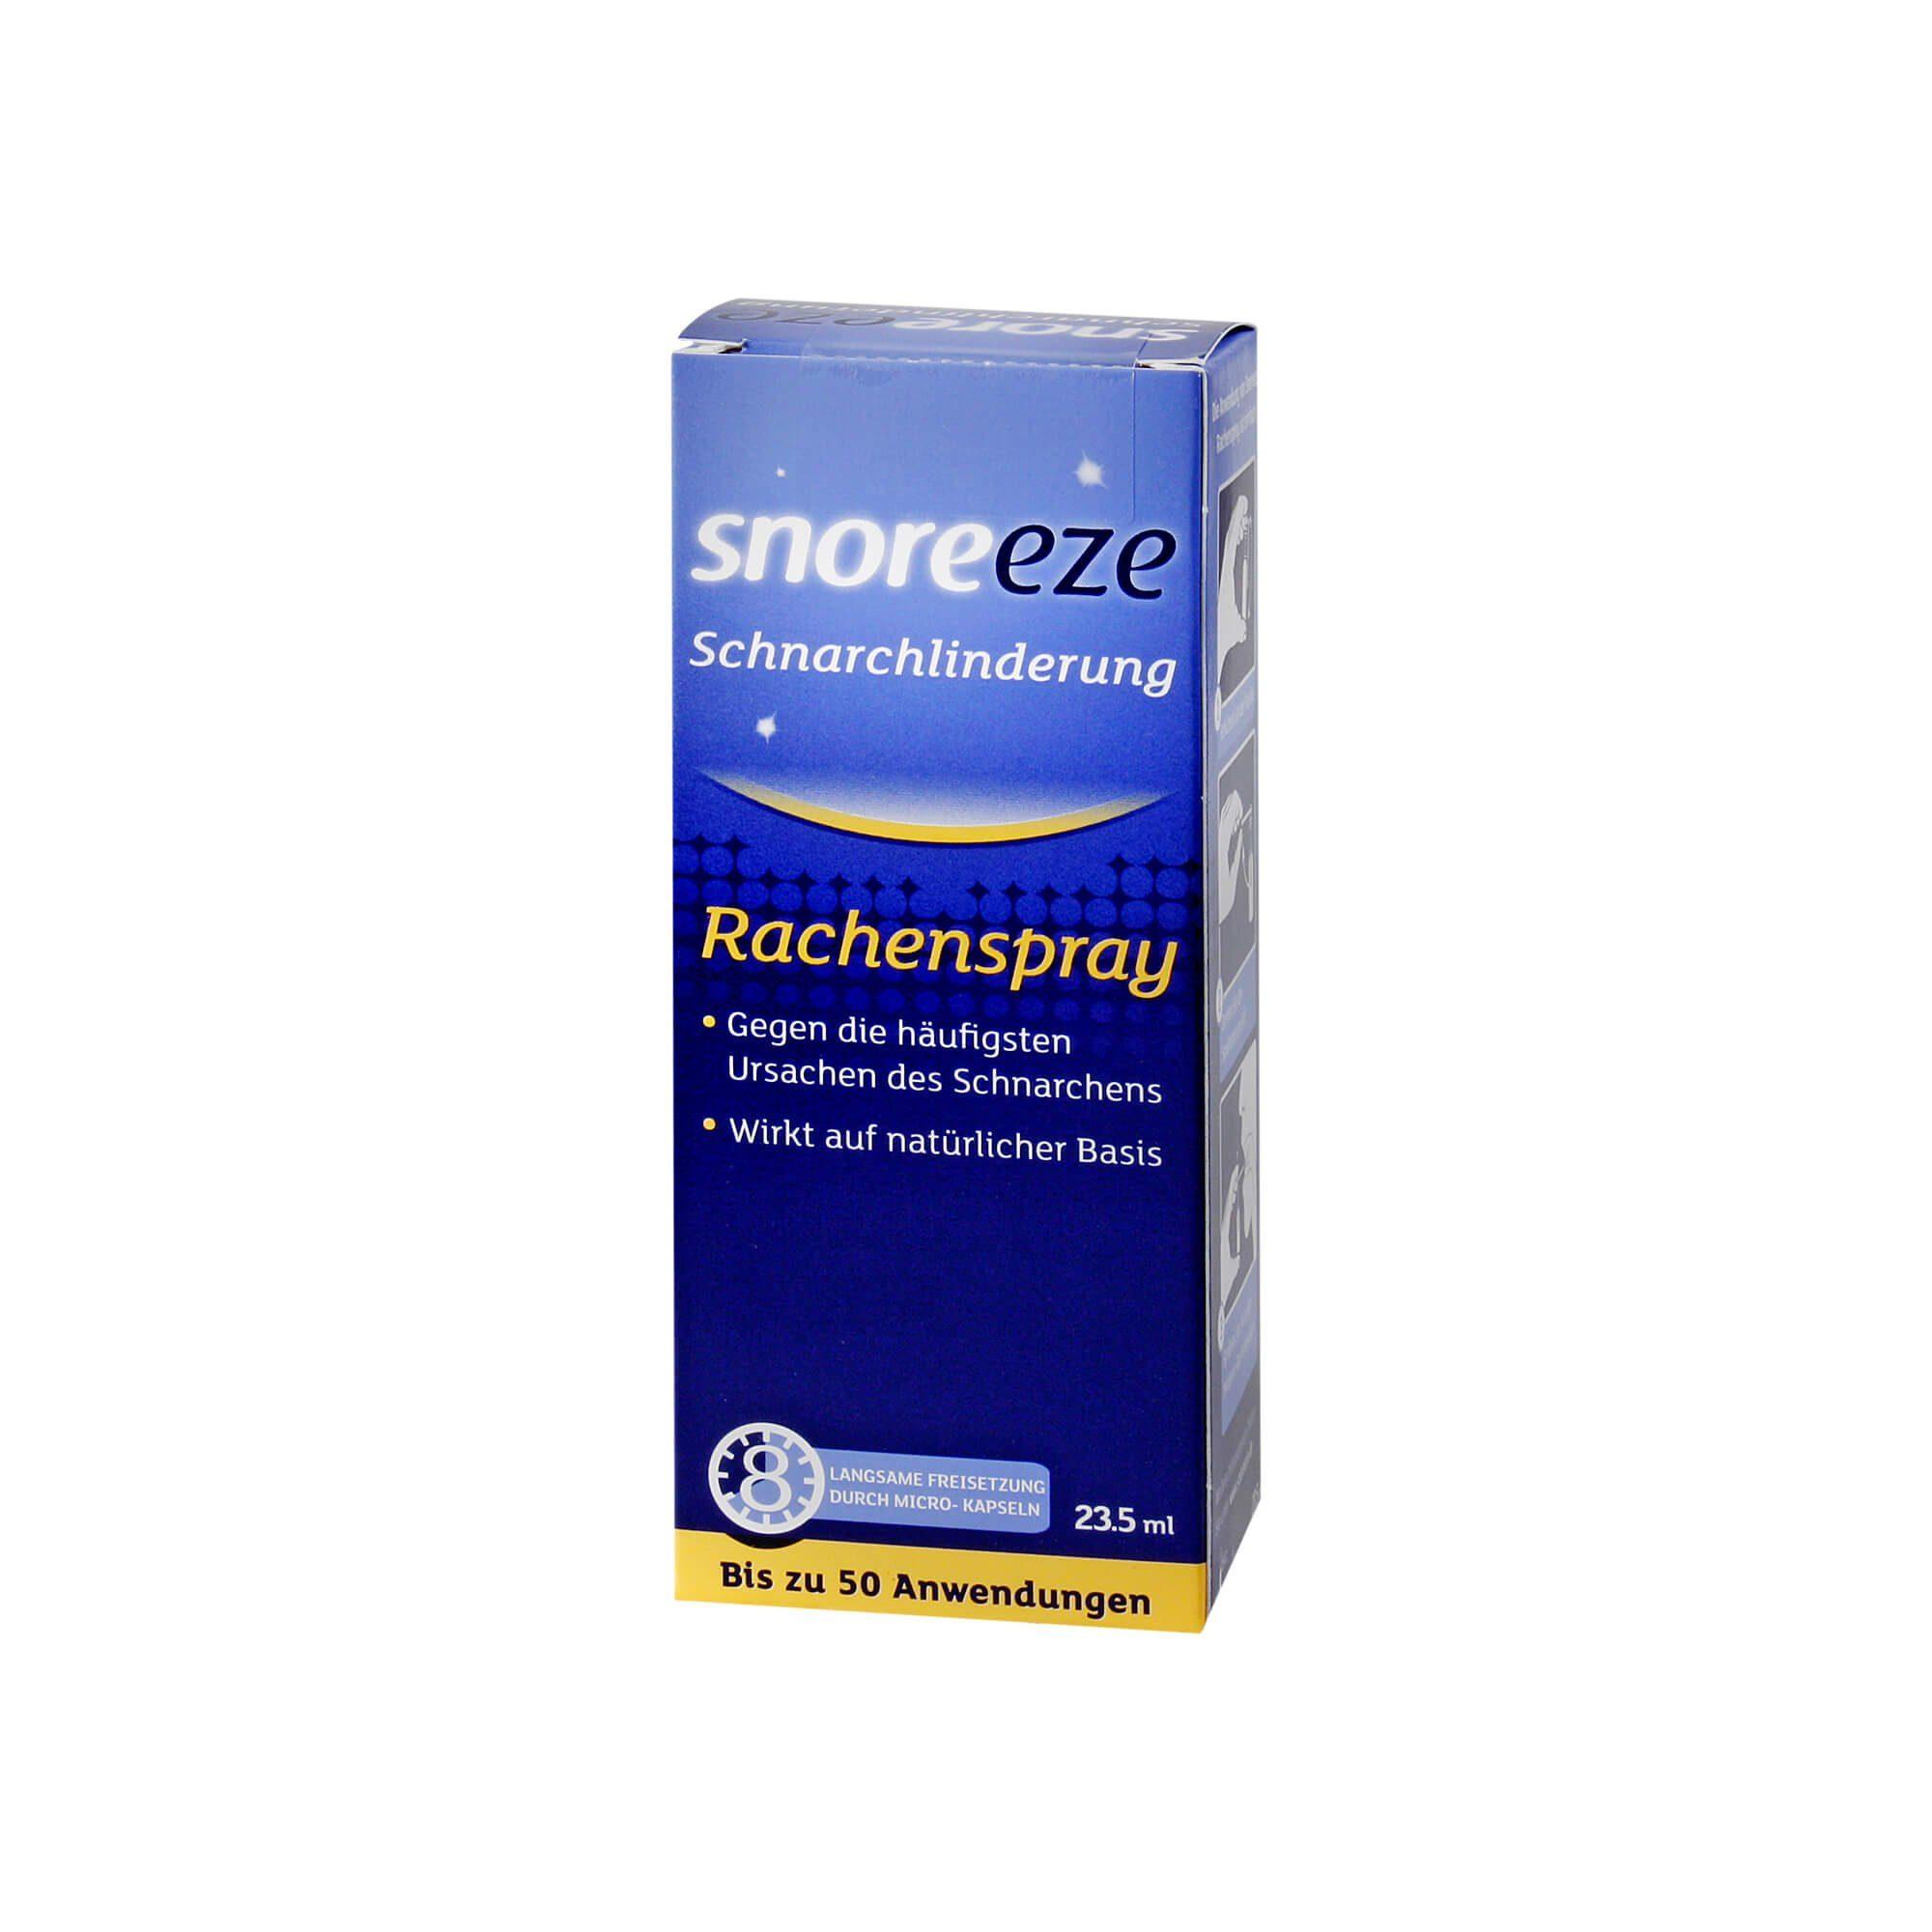 SNOREEZE RACHENSPRAY, 23.5 ml